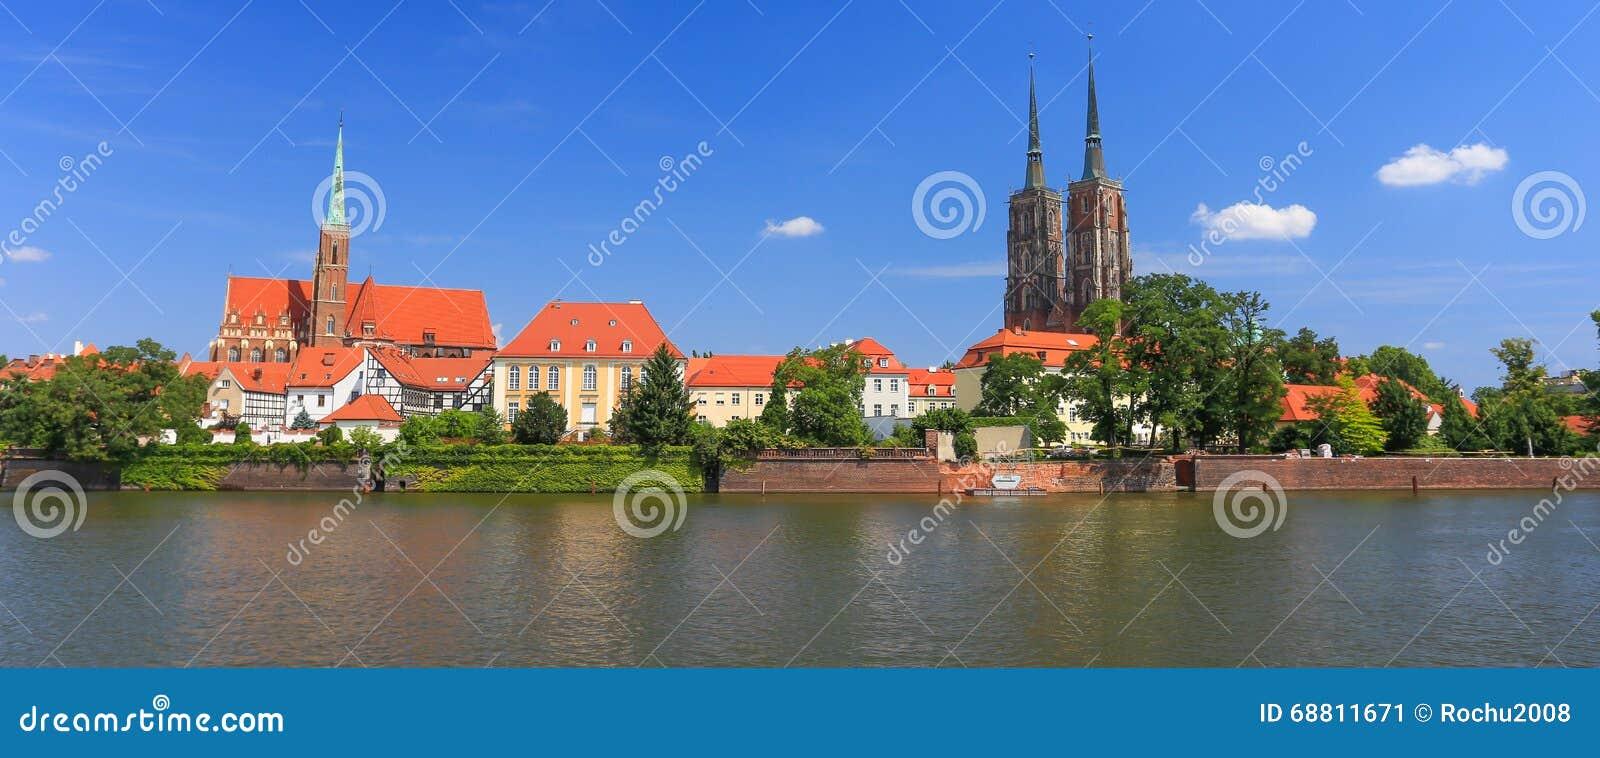 Une vue de Wroclaw poland